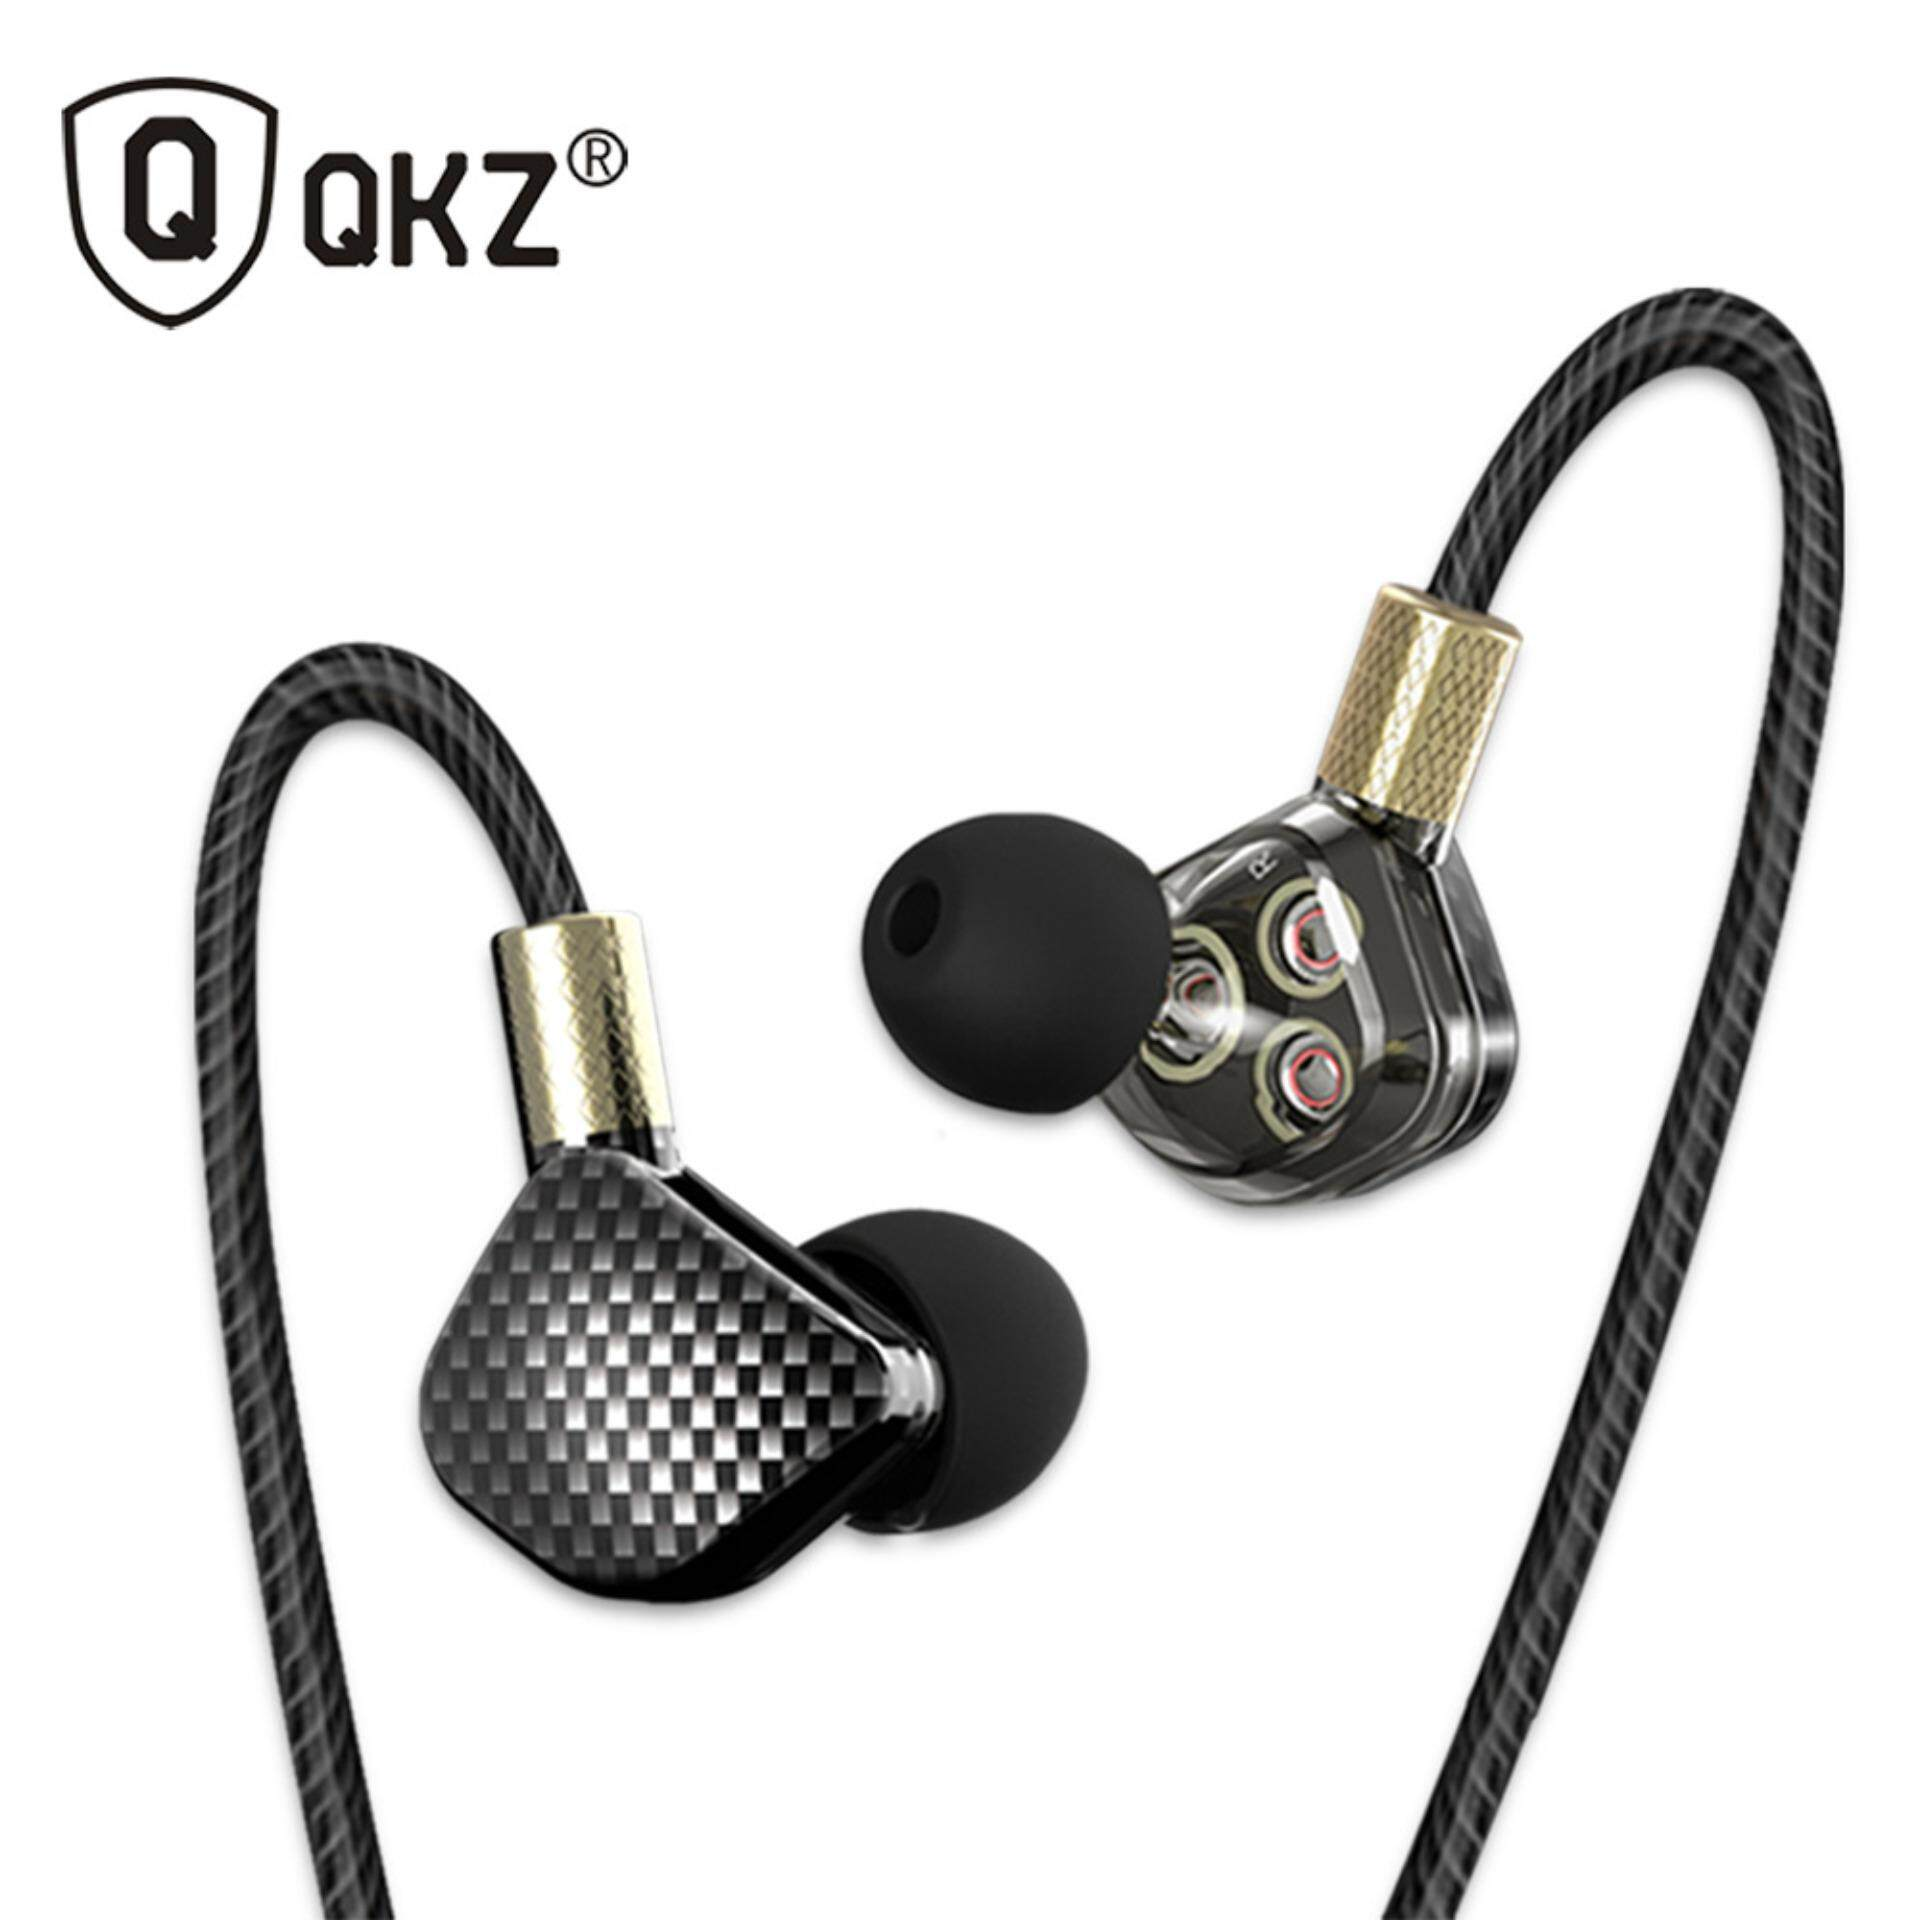 Buy Sell Cheapest Qkz Kd6 Enam Best Quality Product Deals Knowledge Zenith Ck5 Earphone In Ear With Microphone Biru Dinamis Headphone Bass Olahraga Hi Fi Gantung K Universal